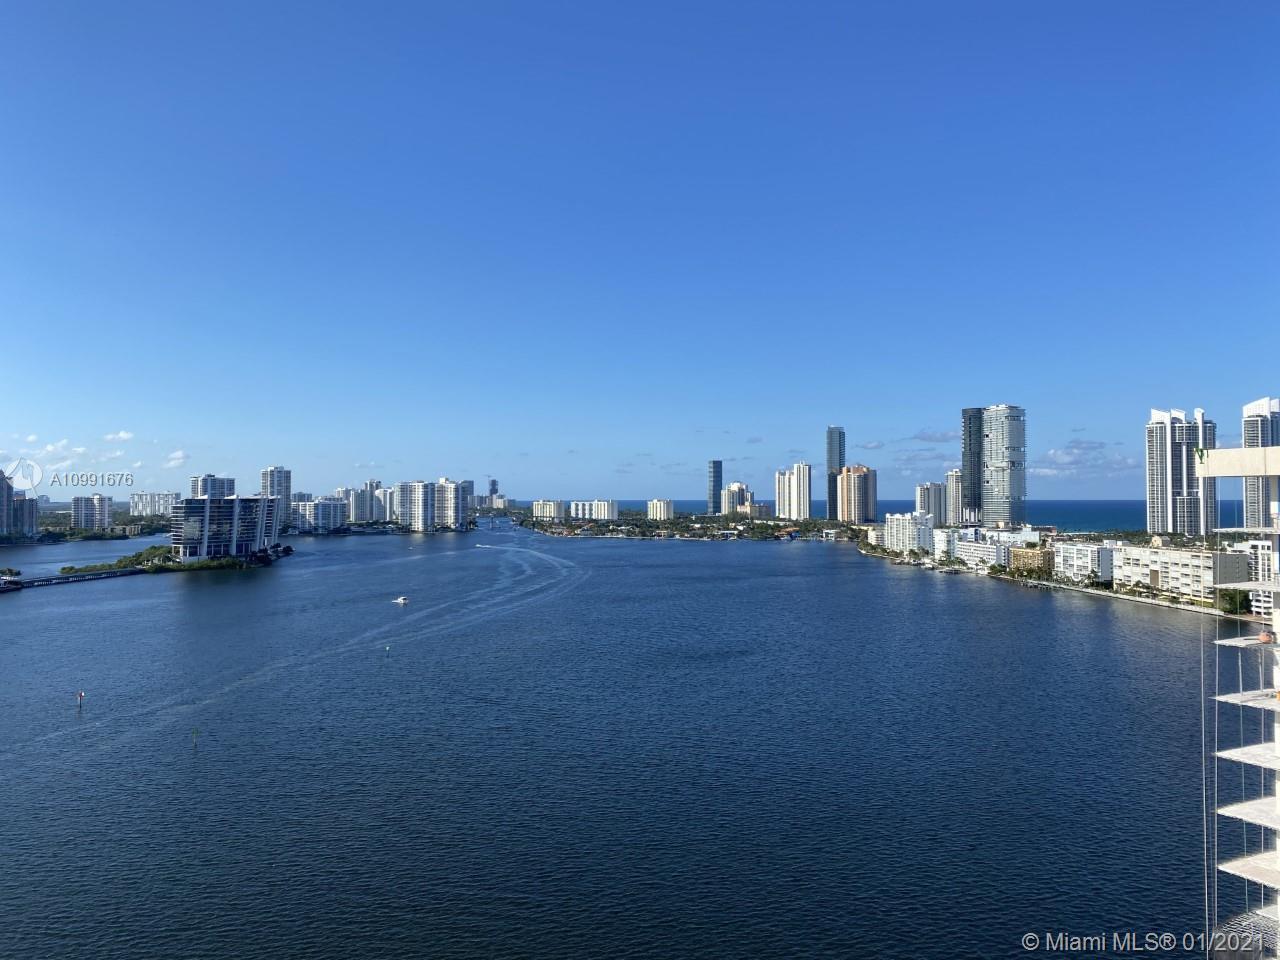 Winston Tower 500 #PH-03 - 301 174th St #PH-03, Sunny Isles Beach, FL 33160